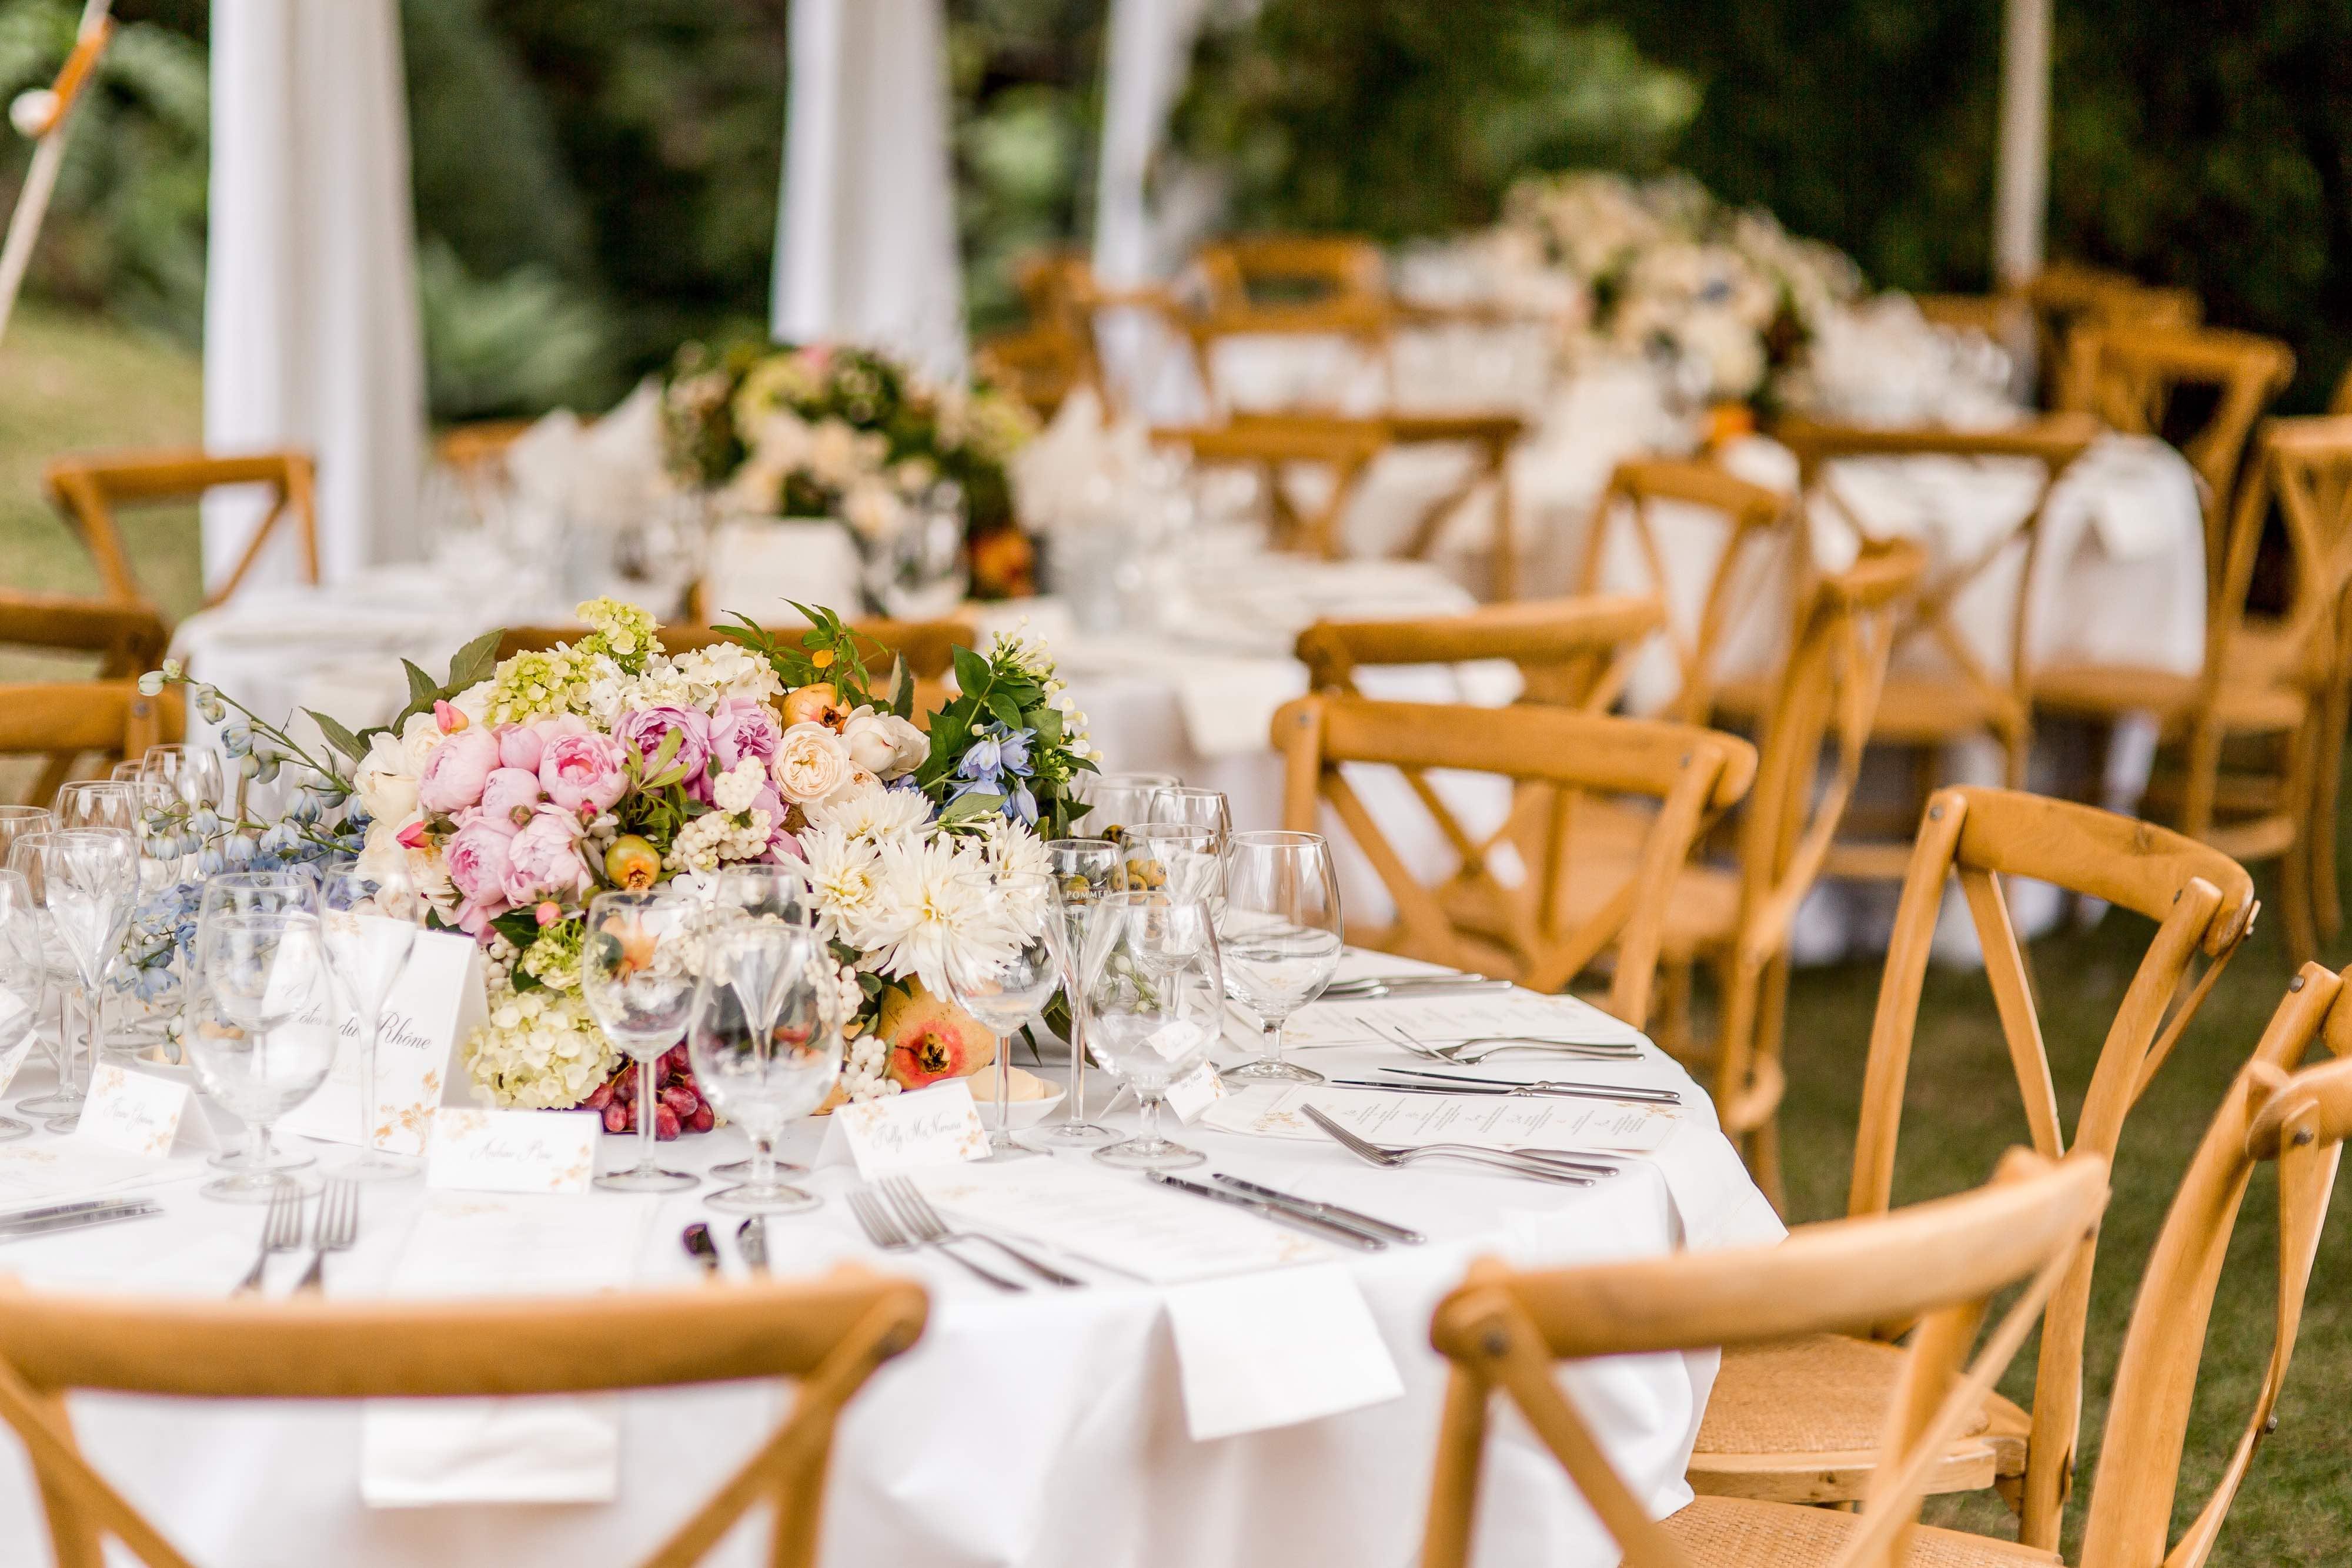 Tintern Wedding P1 - resize